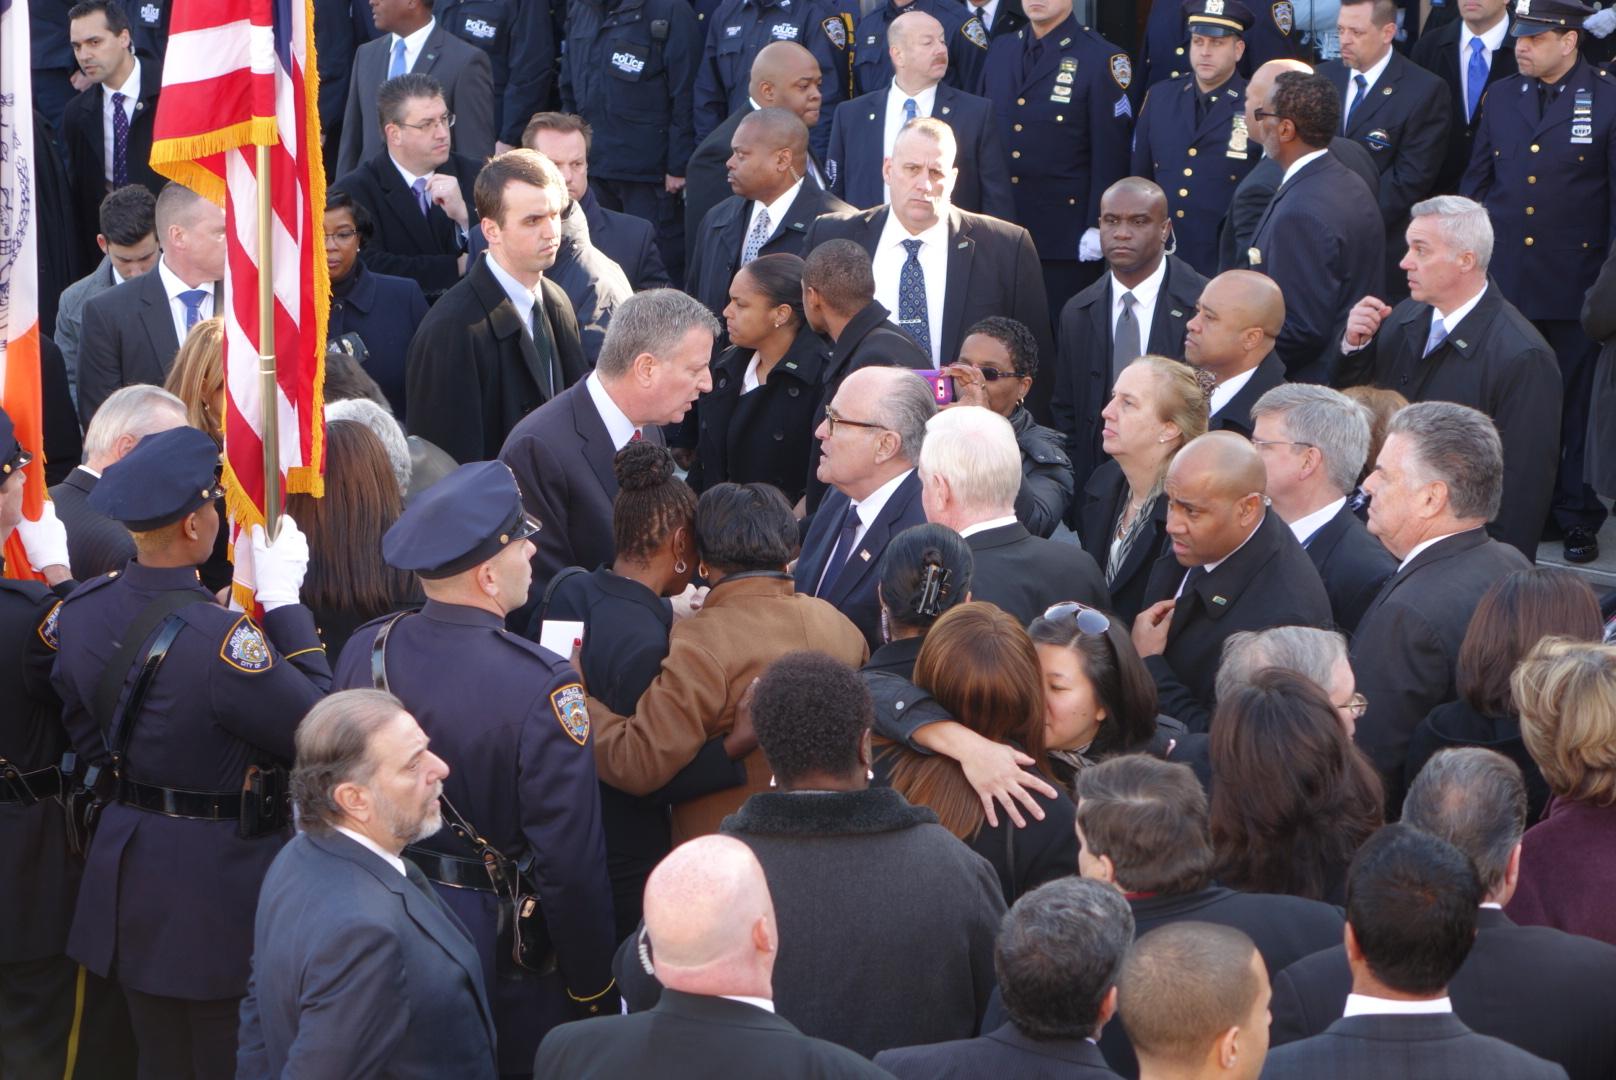 Mayor Bill de Blasio and former Mayor Rudy Giuliani speak briefly following the funeral of Det. Rafael Ramos.